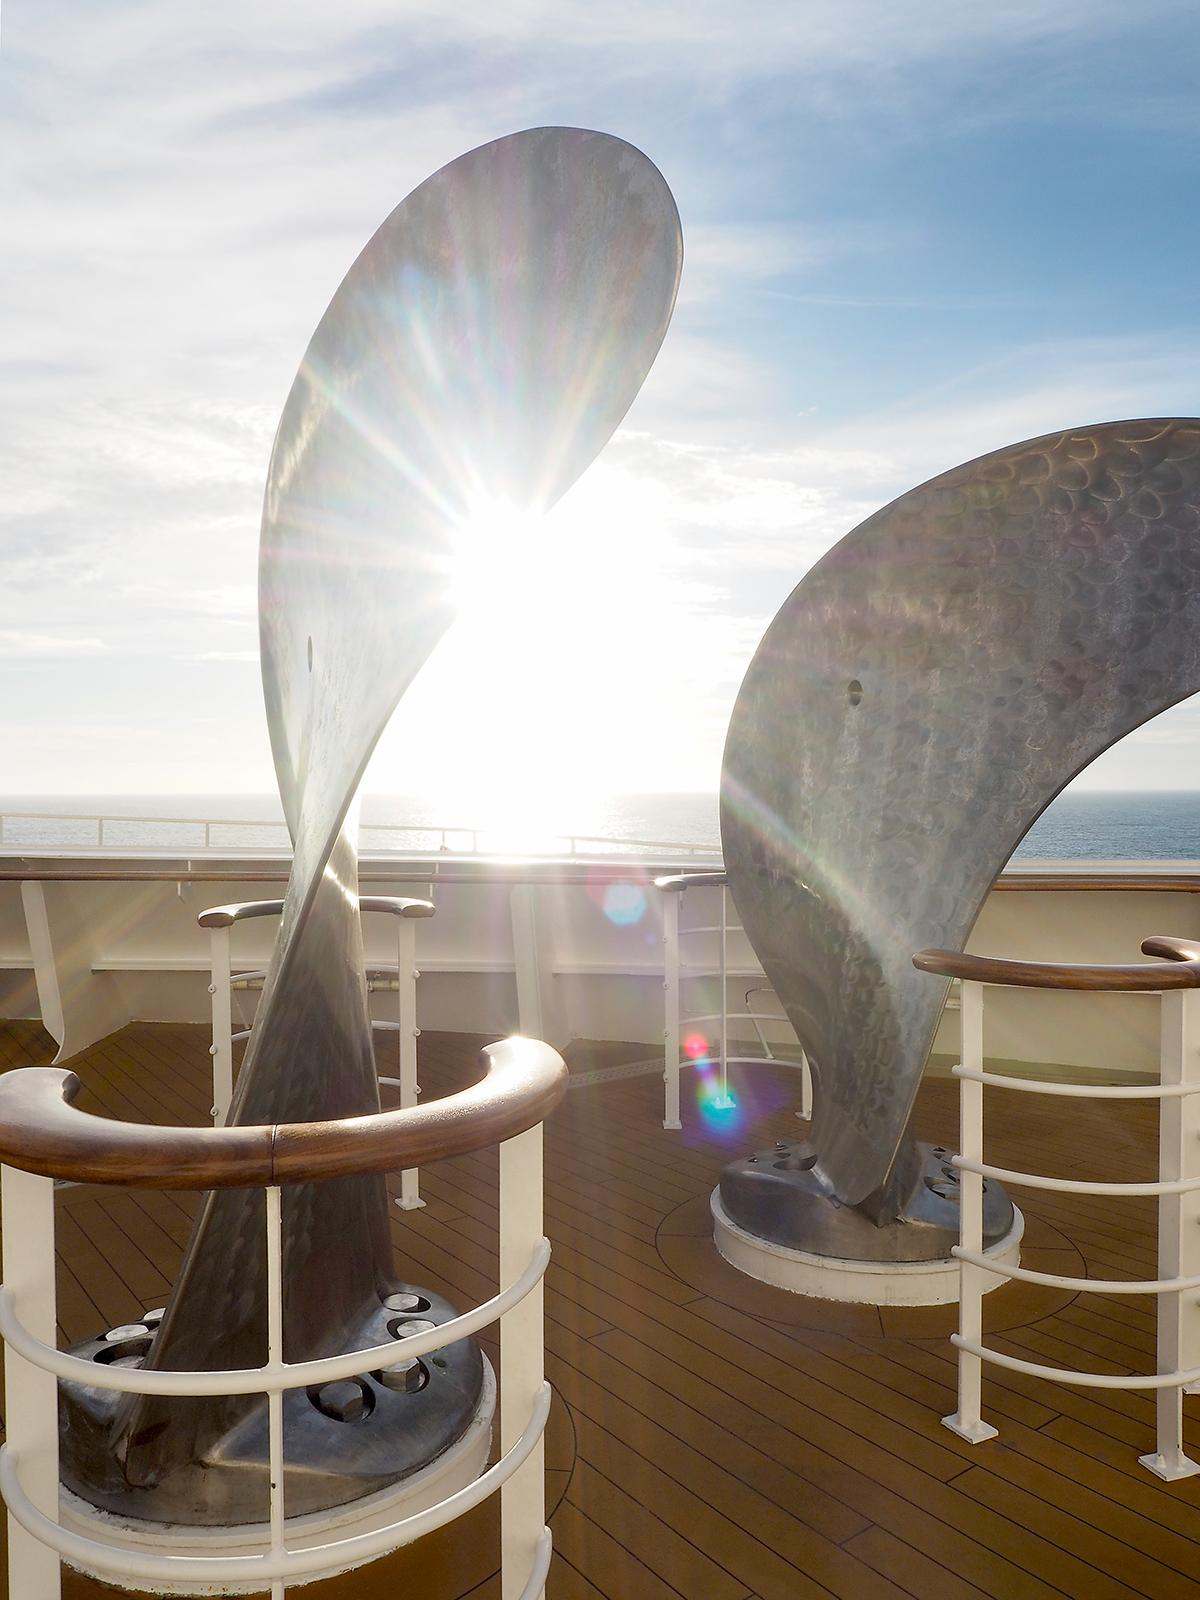 on deck cunard queen mary 2